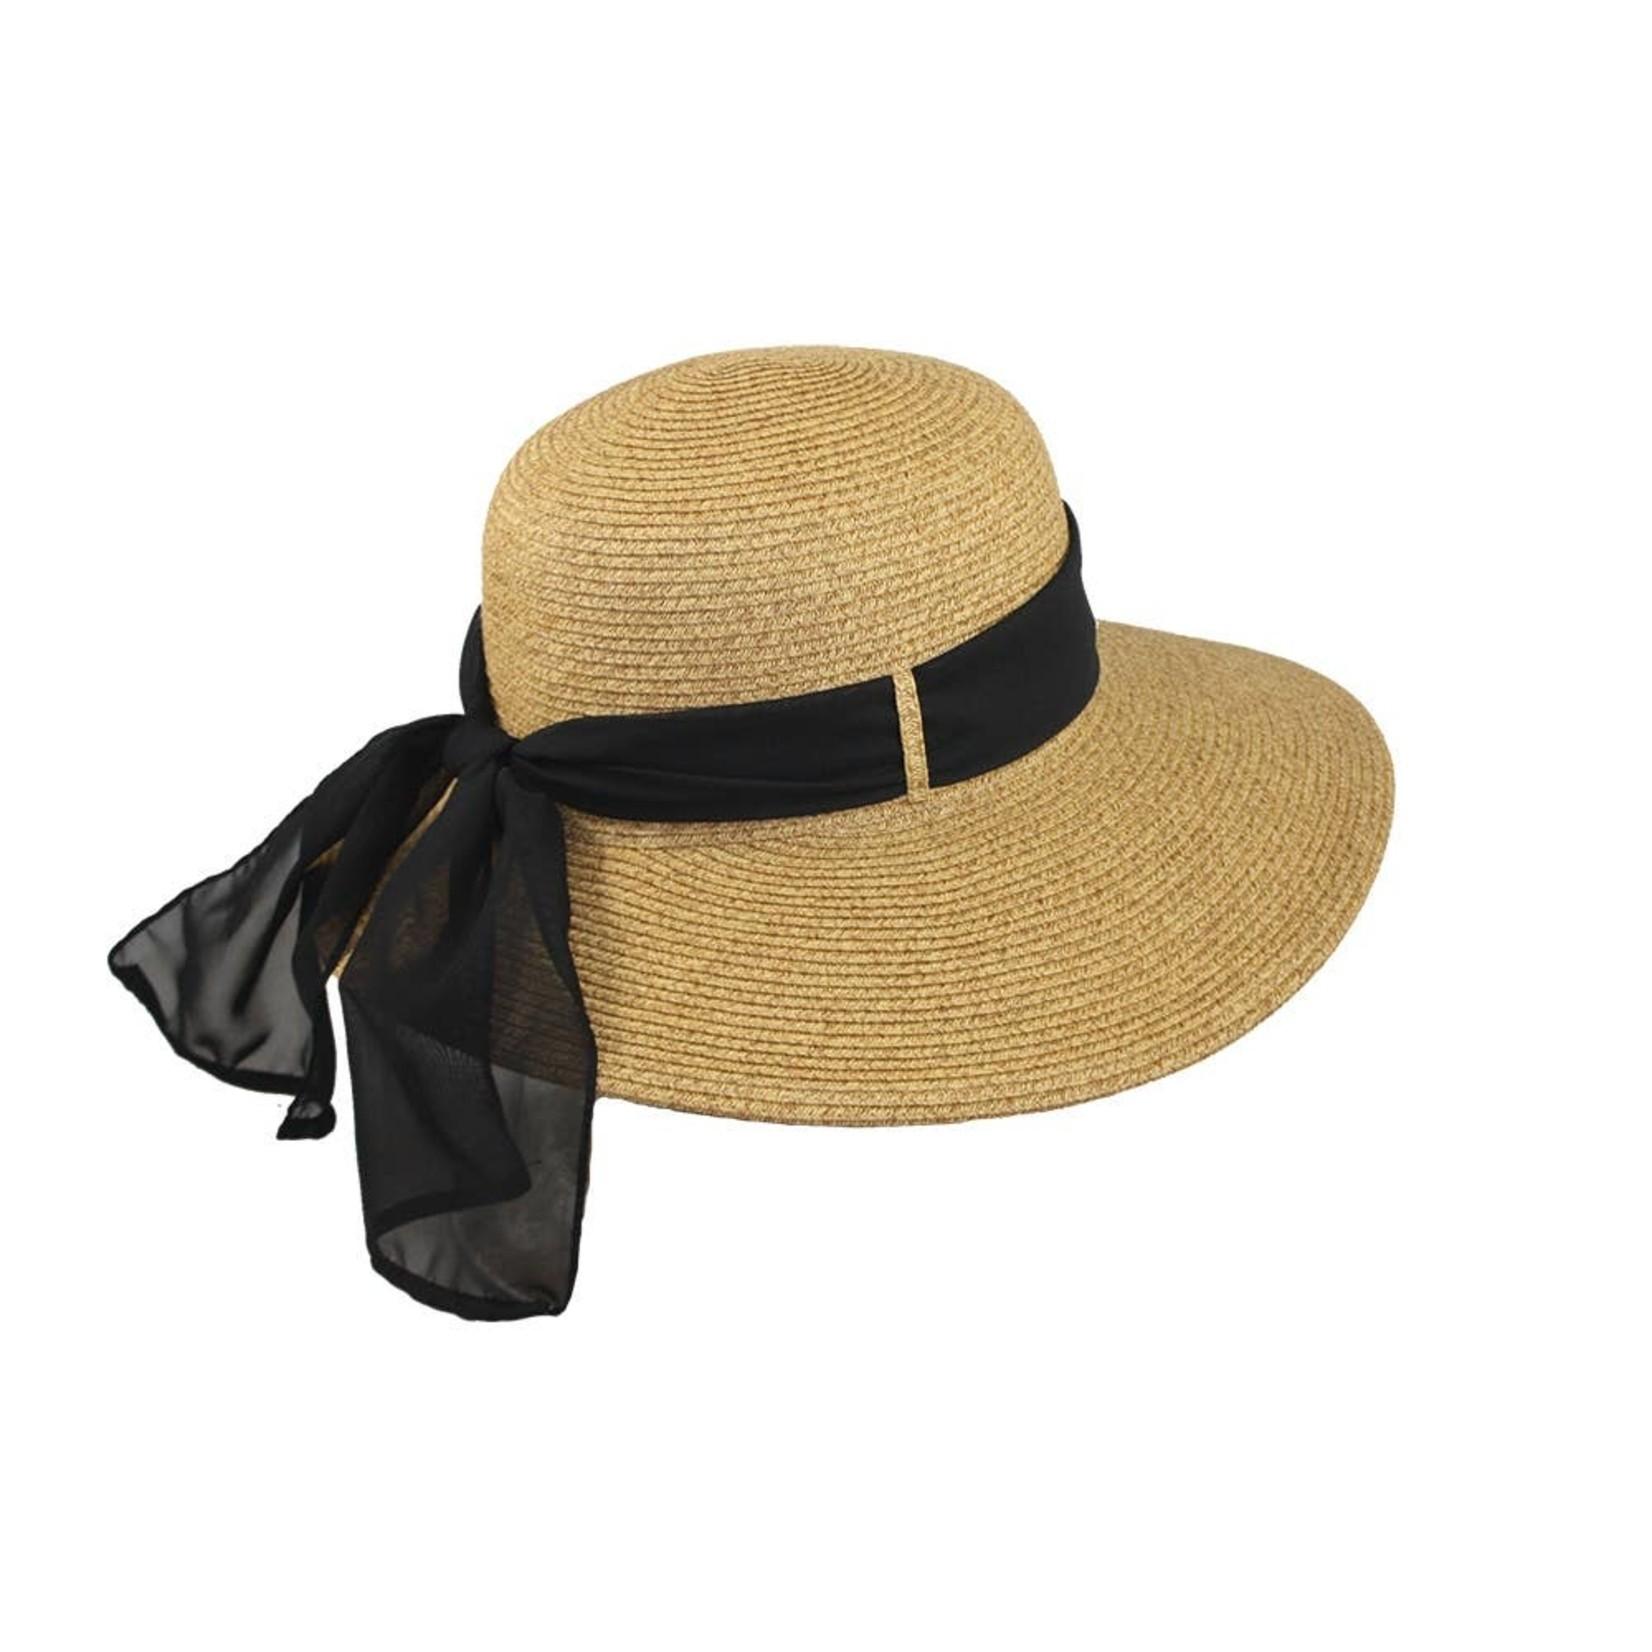 "Jeanne Simmons Tan Tweed 4"" Brim Paper Braid Hat w/Black Ribbon"